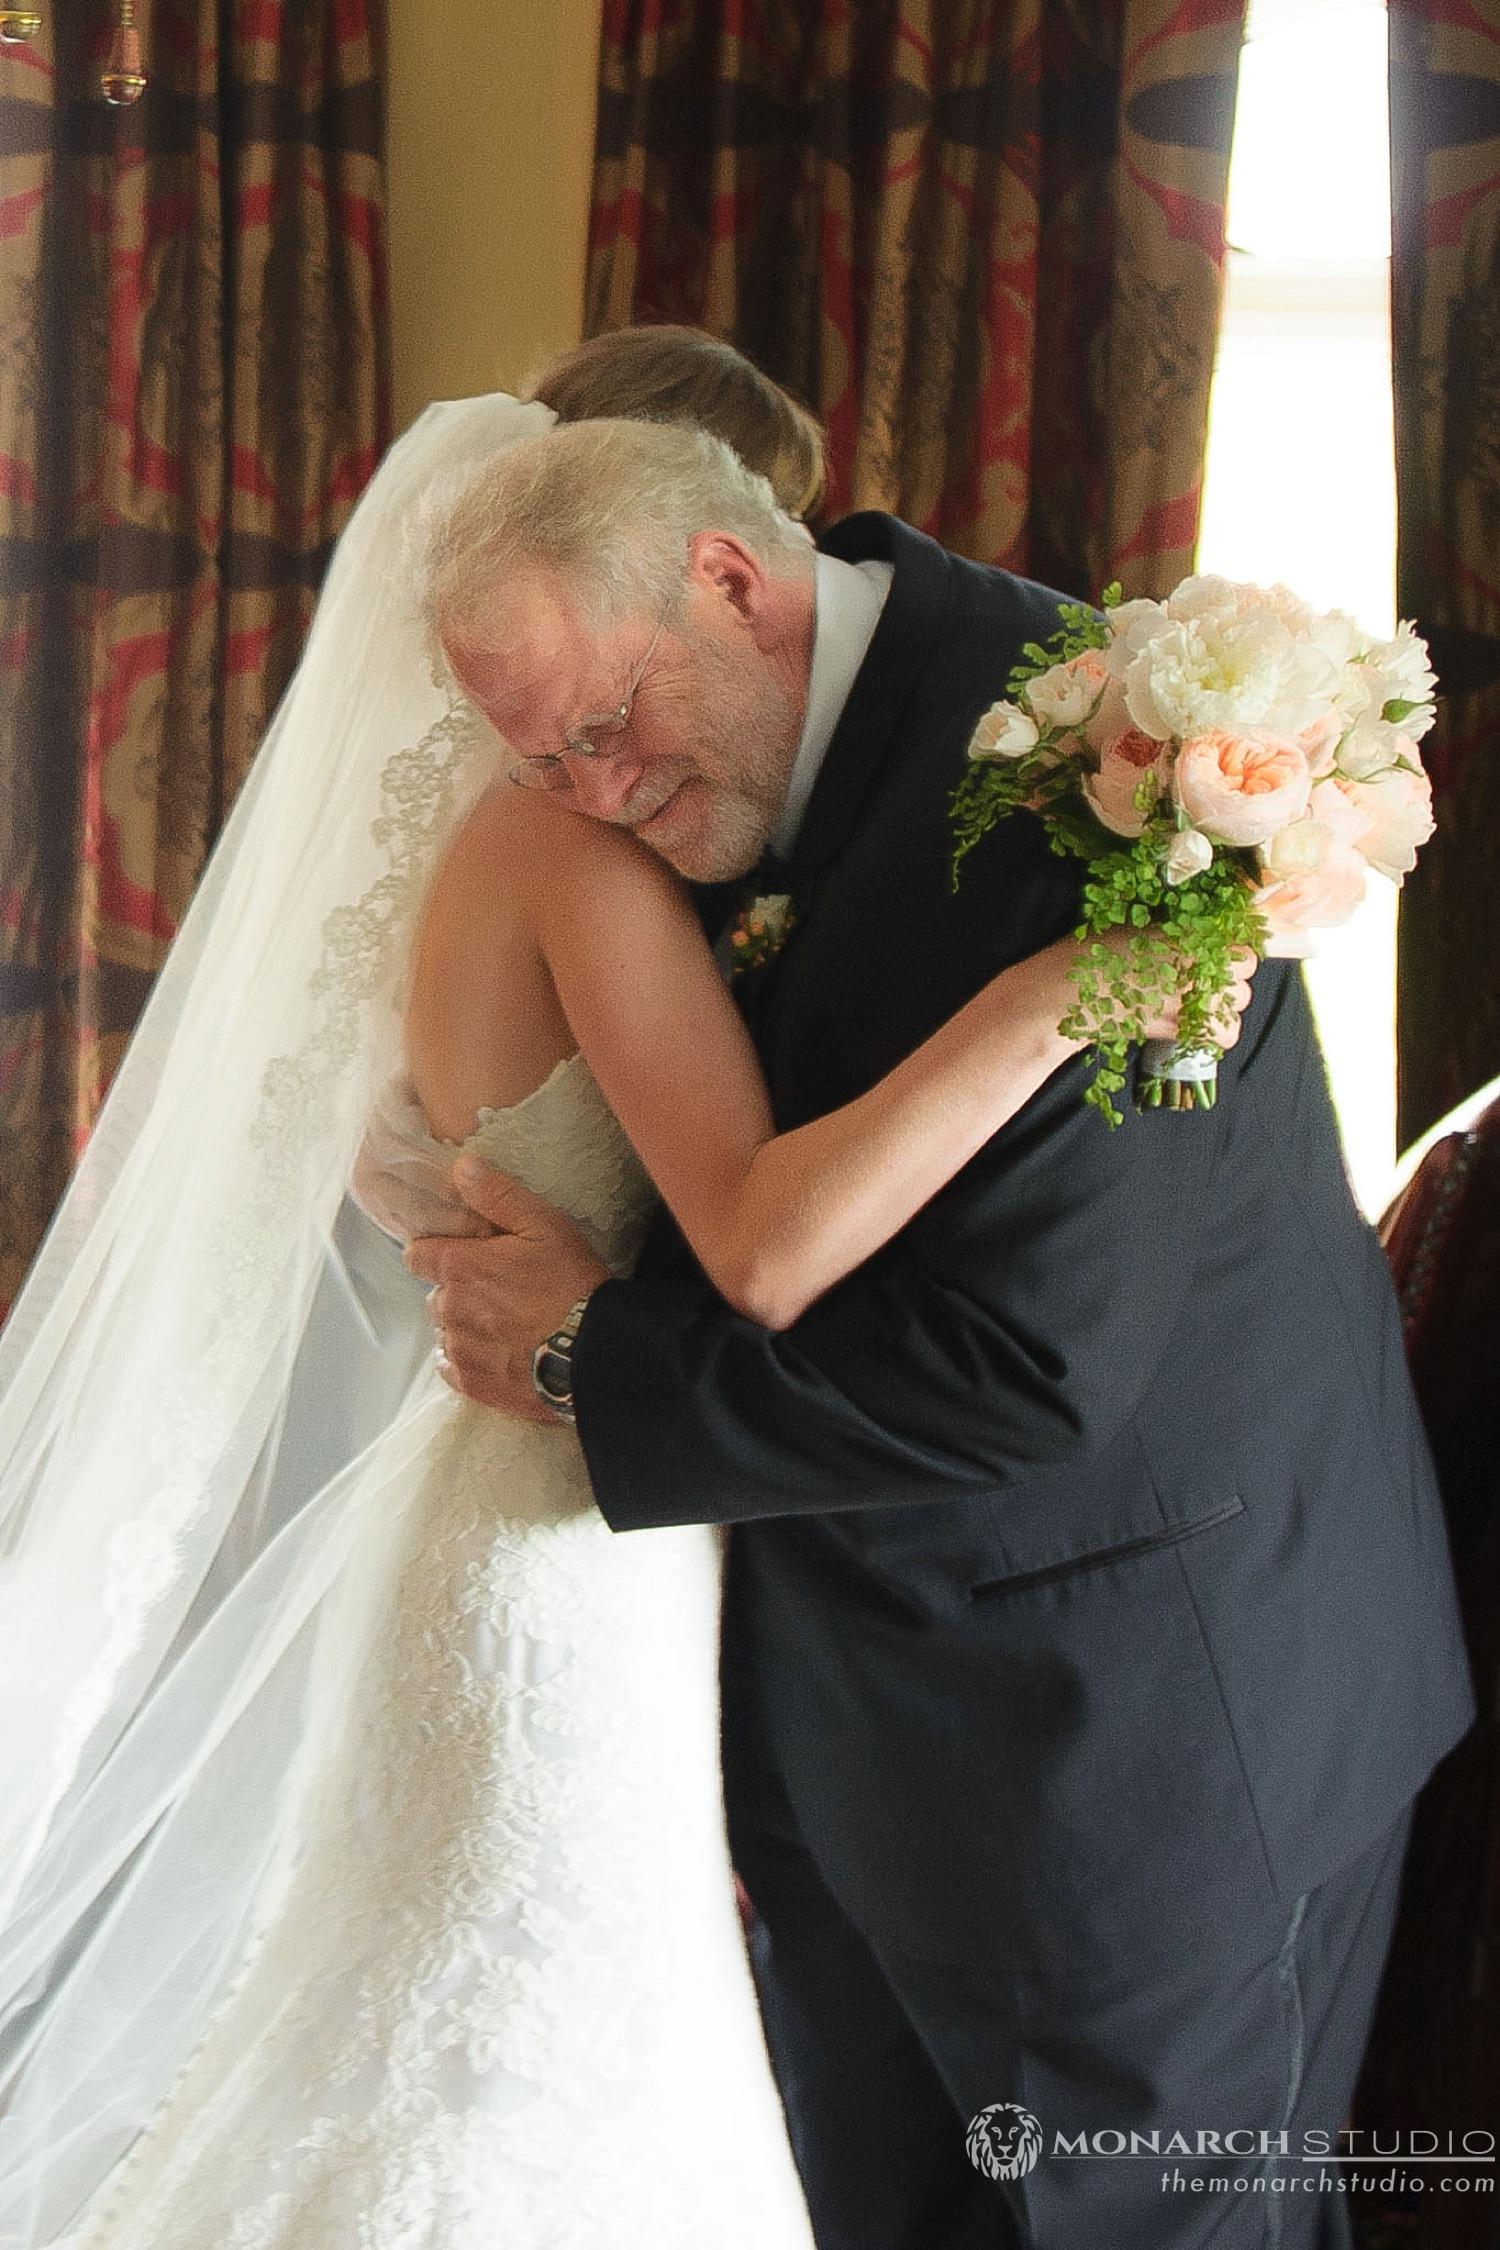 St-Augustine-Wedding-Photographer-Zach-Thomas-Riverhouse-Monarch-020.JPG